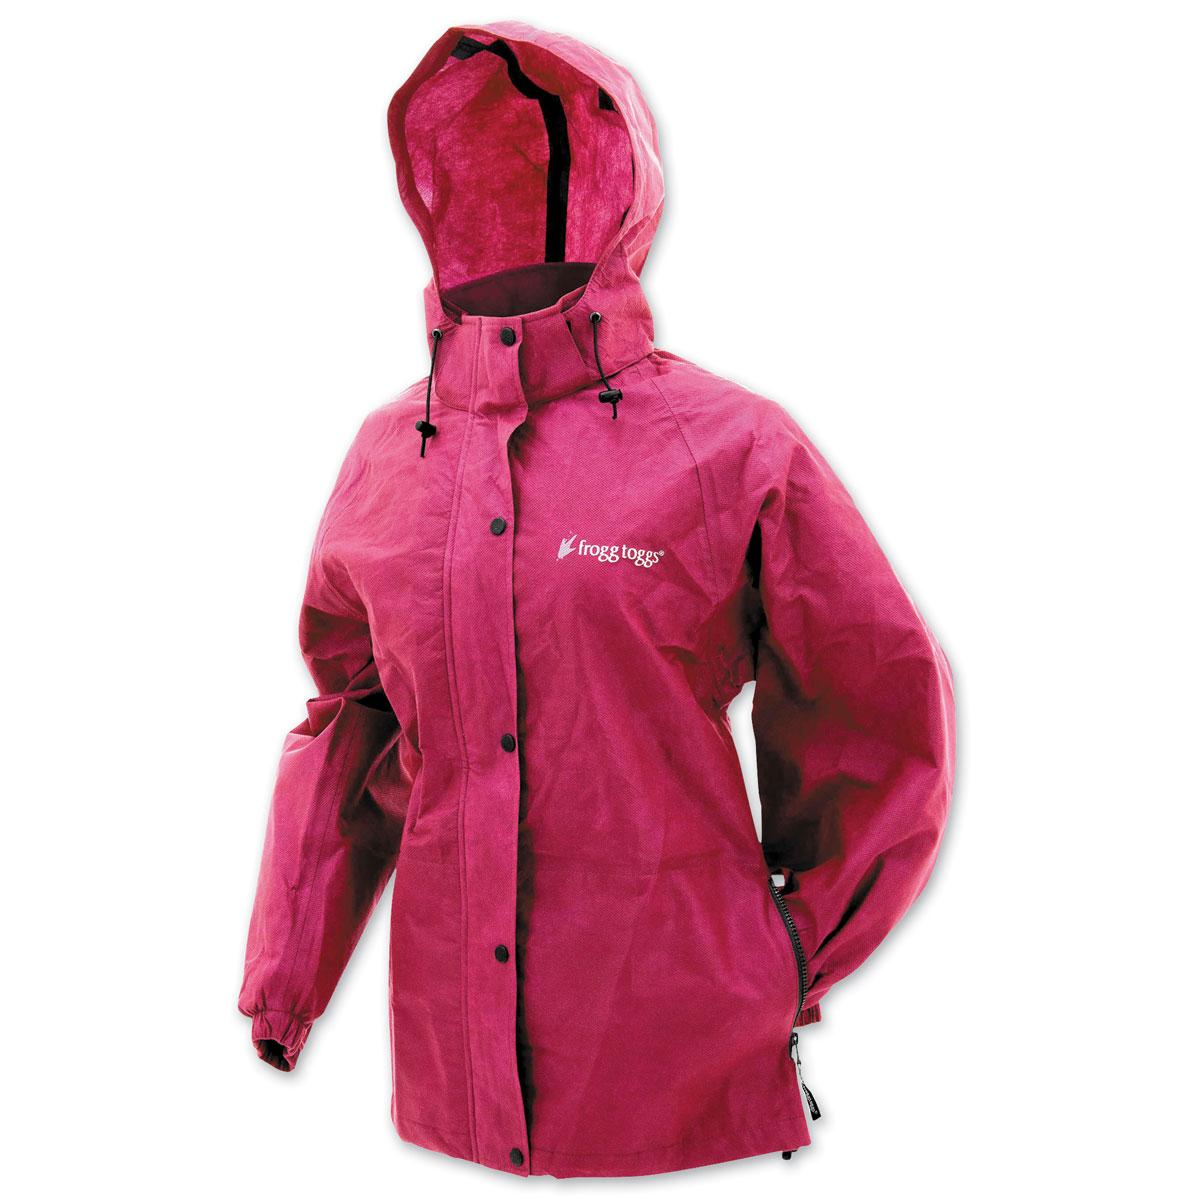 Frogg Toggs Women's Pro Action Cherry Rain Jacket